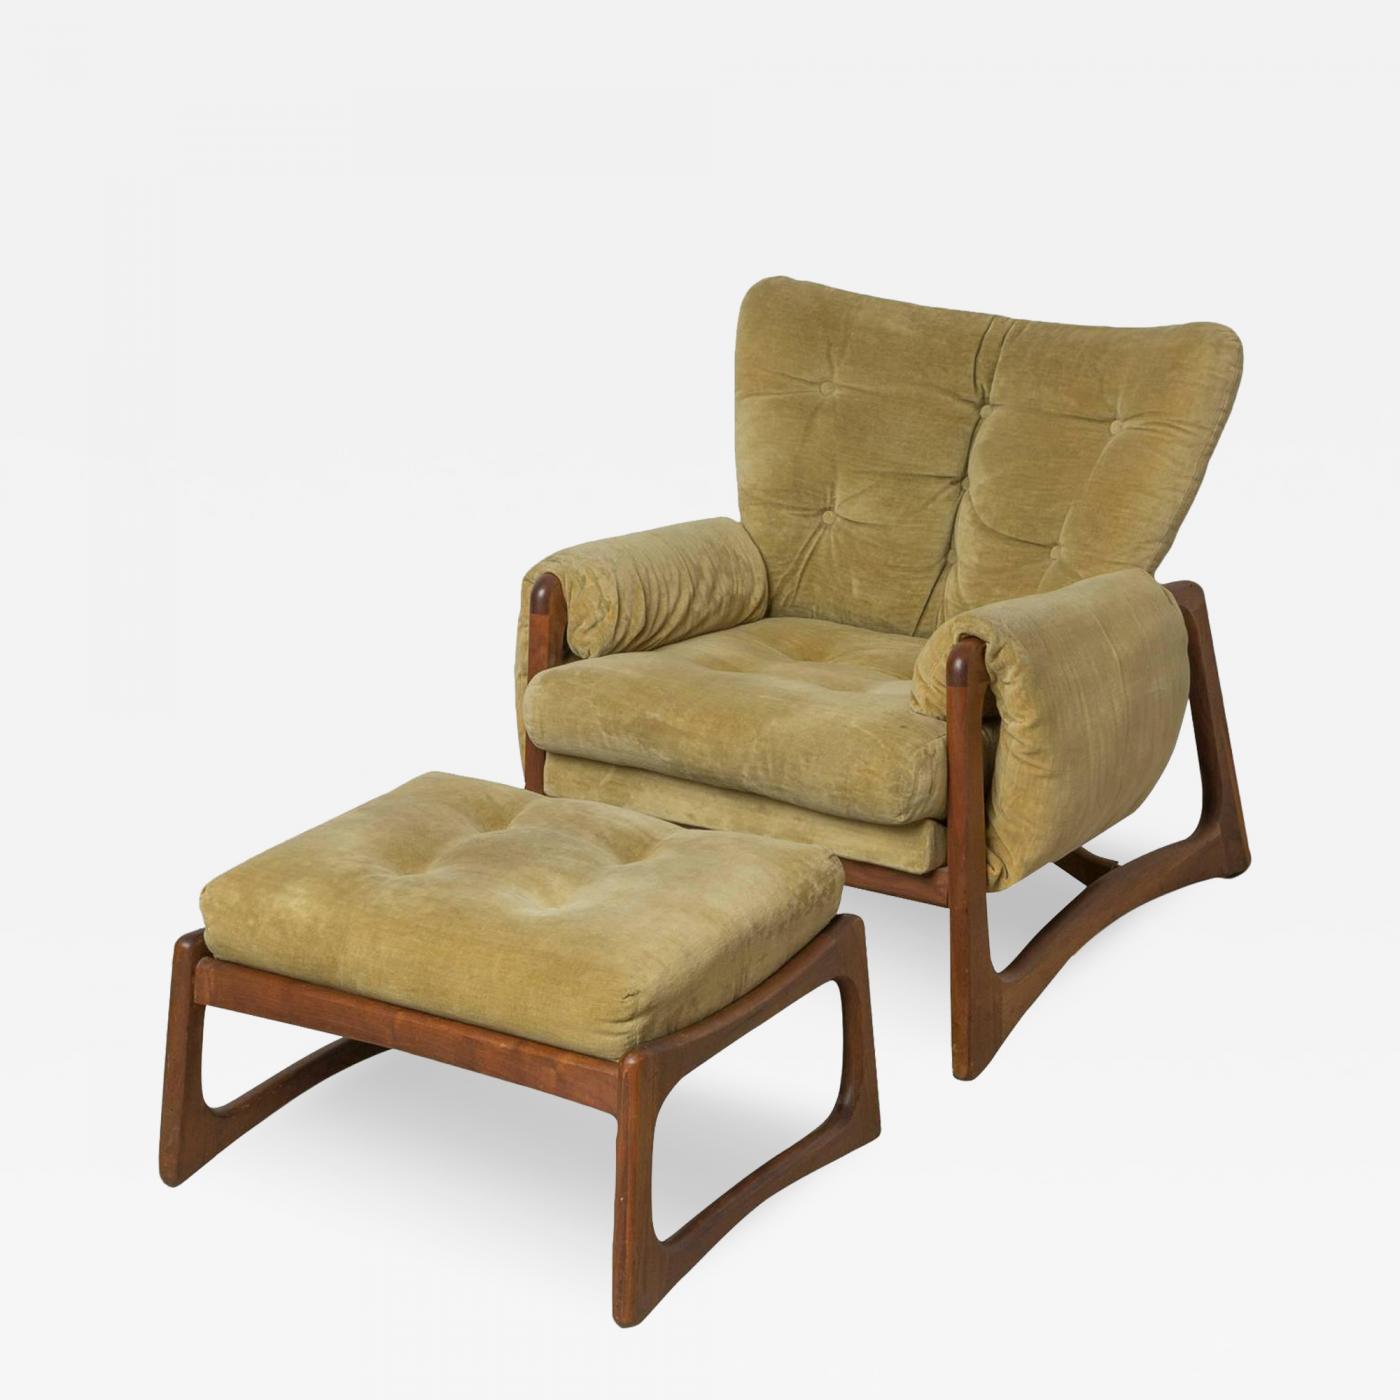 Adrian Pearsall Green Adrian Pearsall Lounge Chair & Ottoman